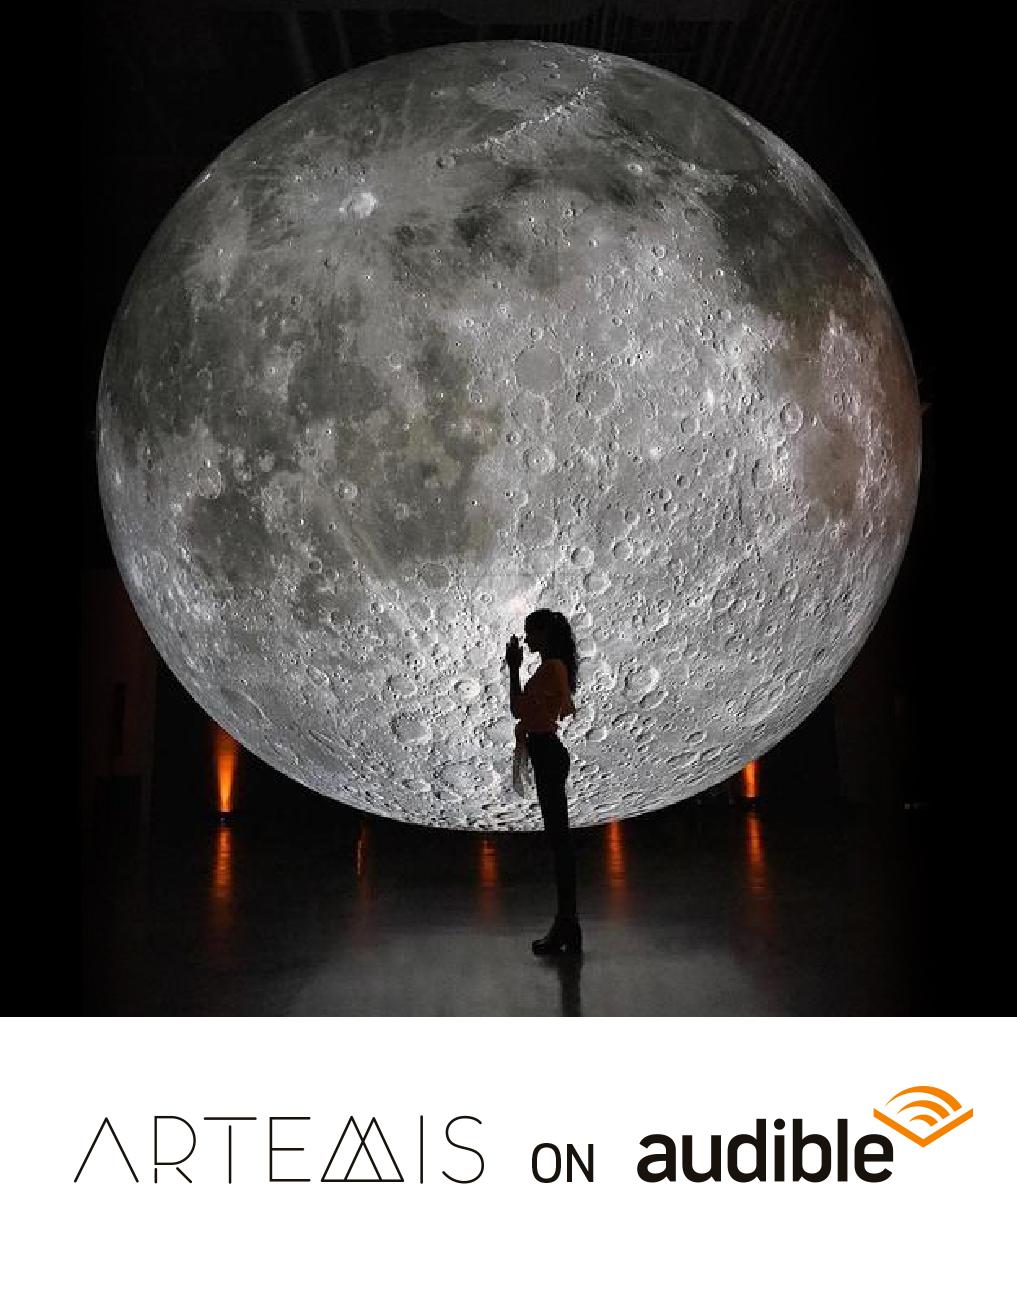 Luster Hashtag Printers - Artemis on Audible